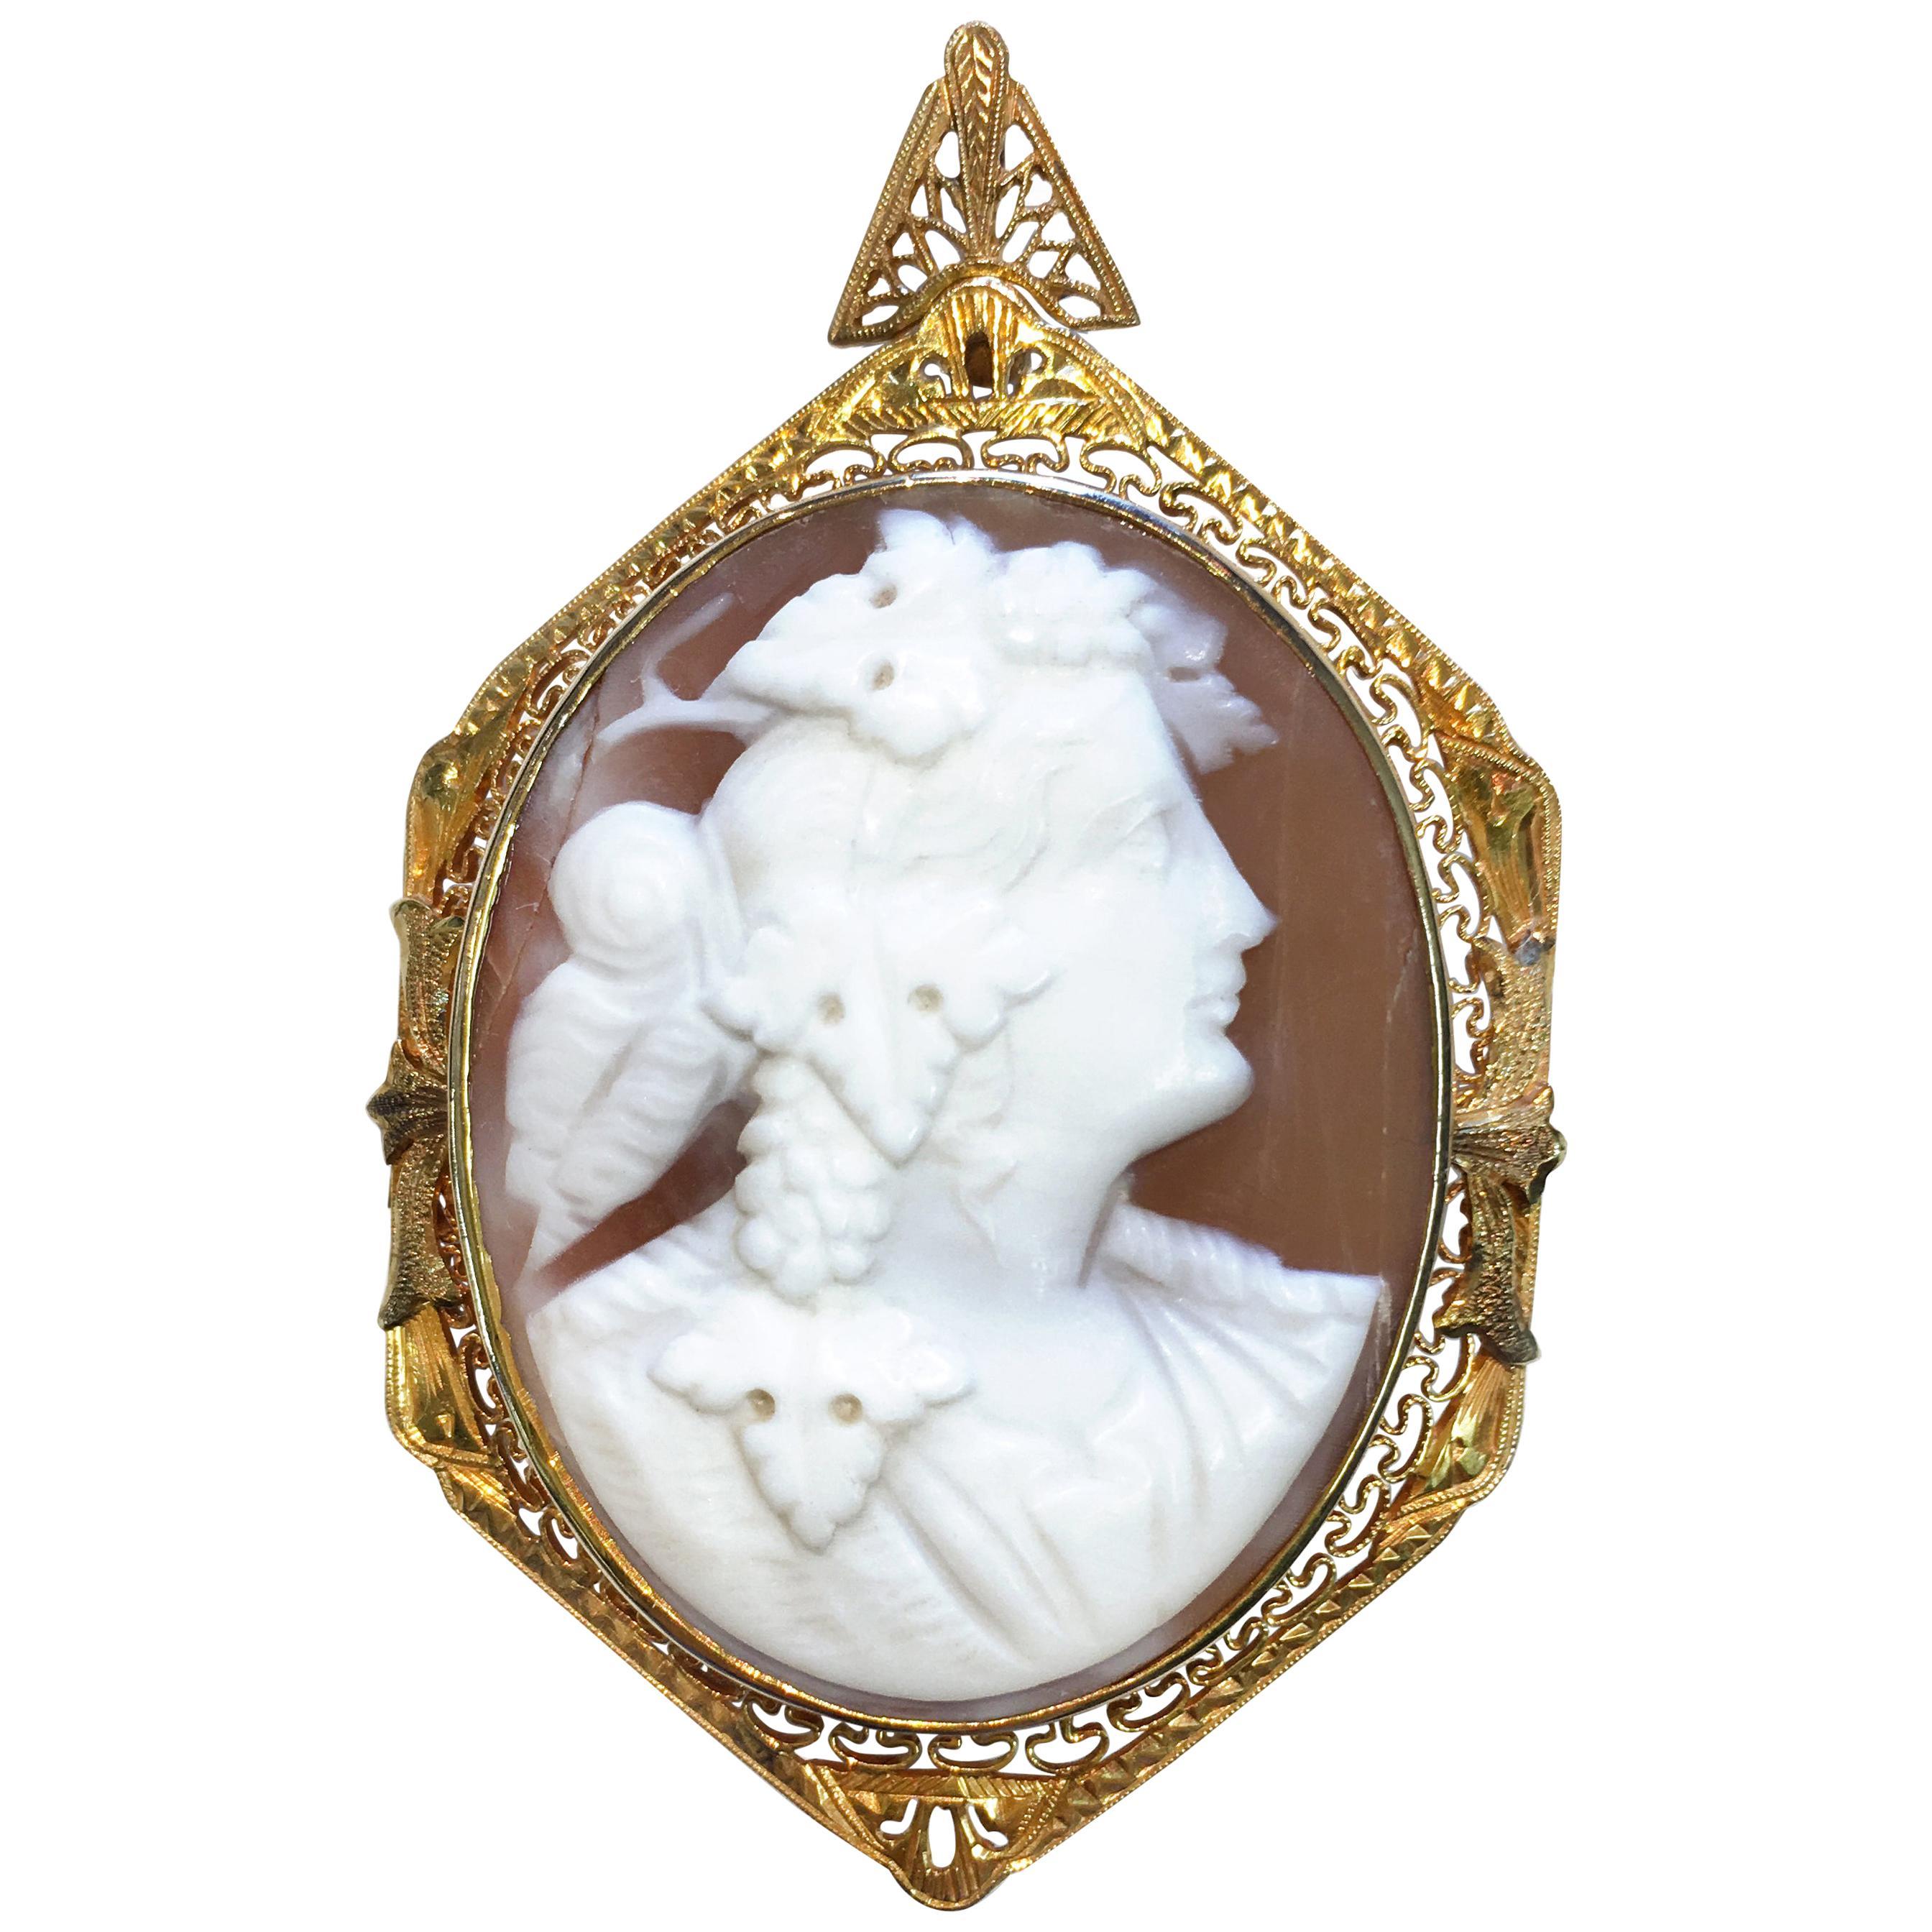 Antique 14 Karat Carved Shell Cameo Brooch Pendant